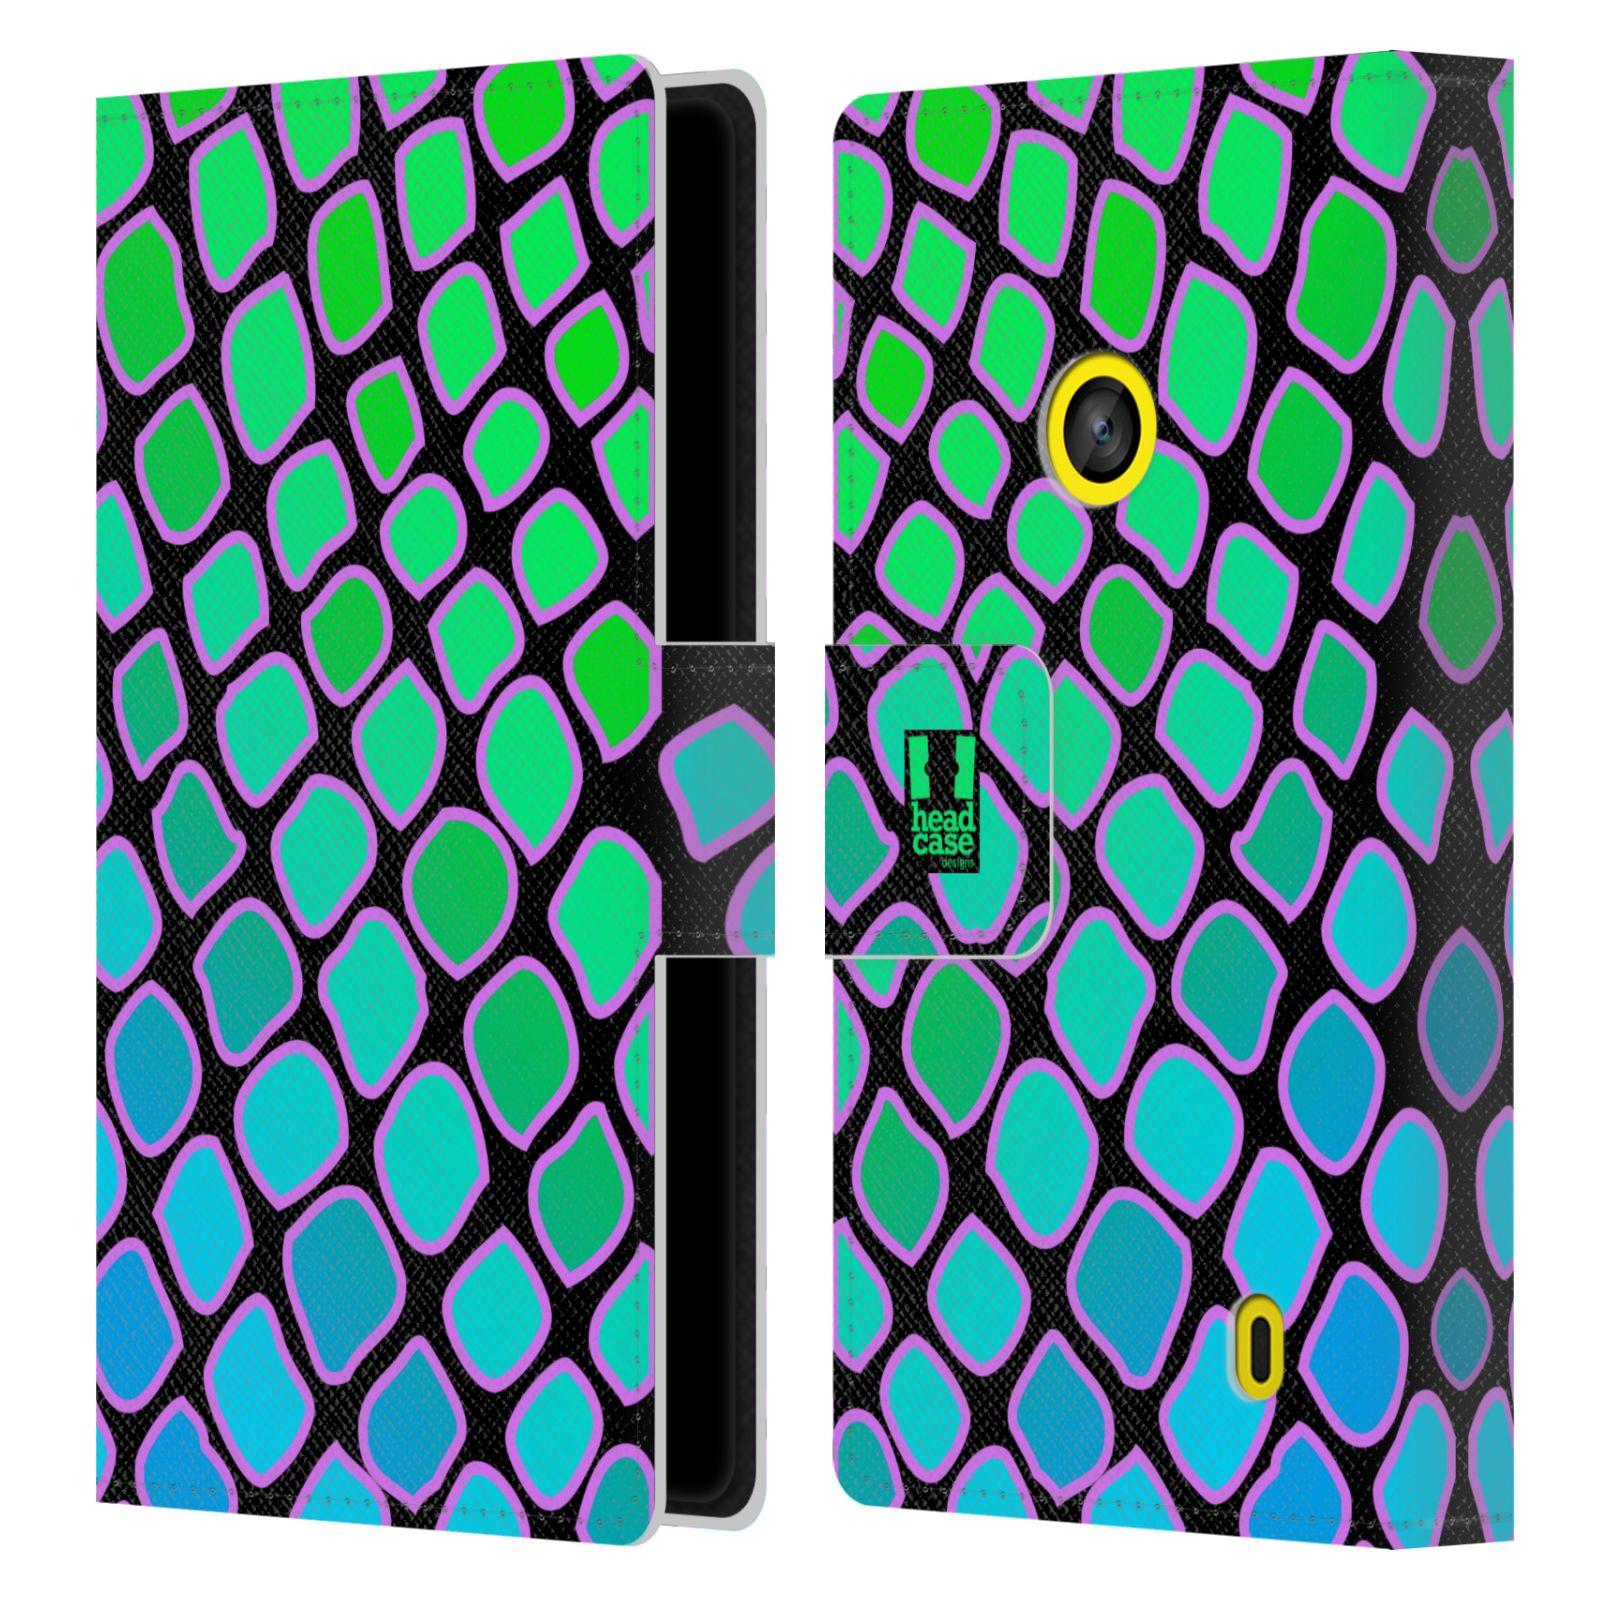 HEAD CASE Flipové pouzdro pro mobil NOKIA LUMIA 520 / 525 Zvířecí barevné vzory vodní had modrá a zelená barva AQUA